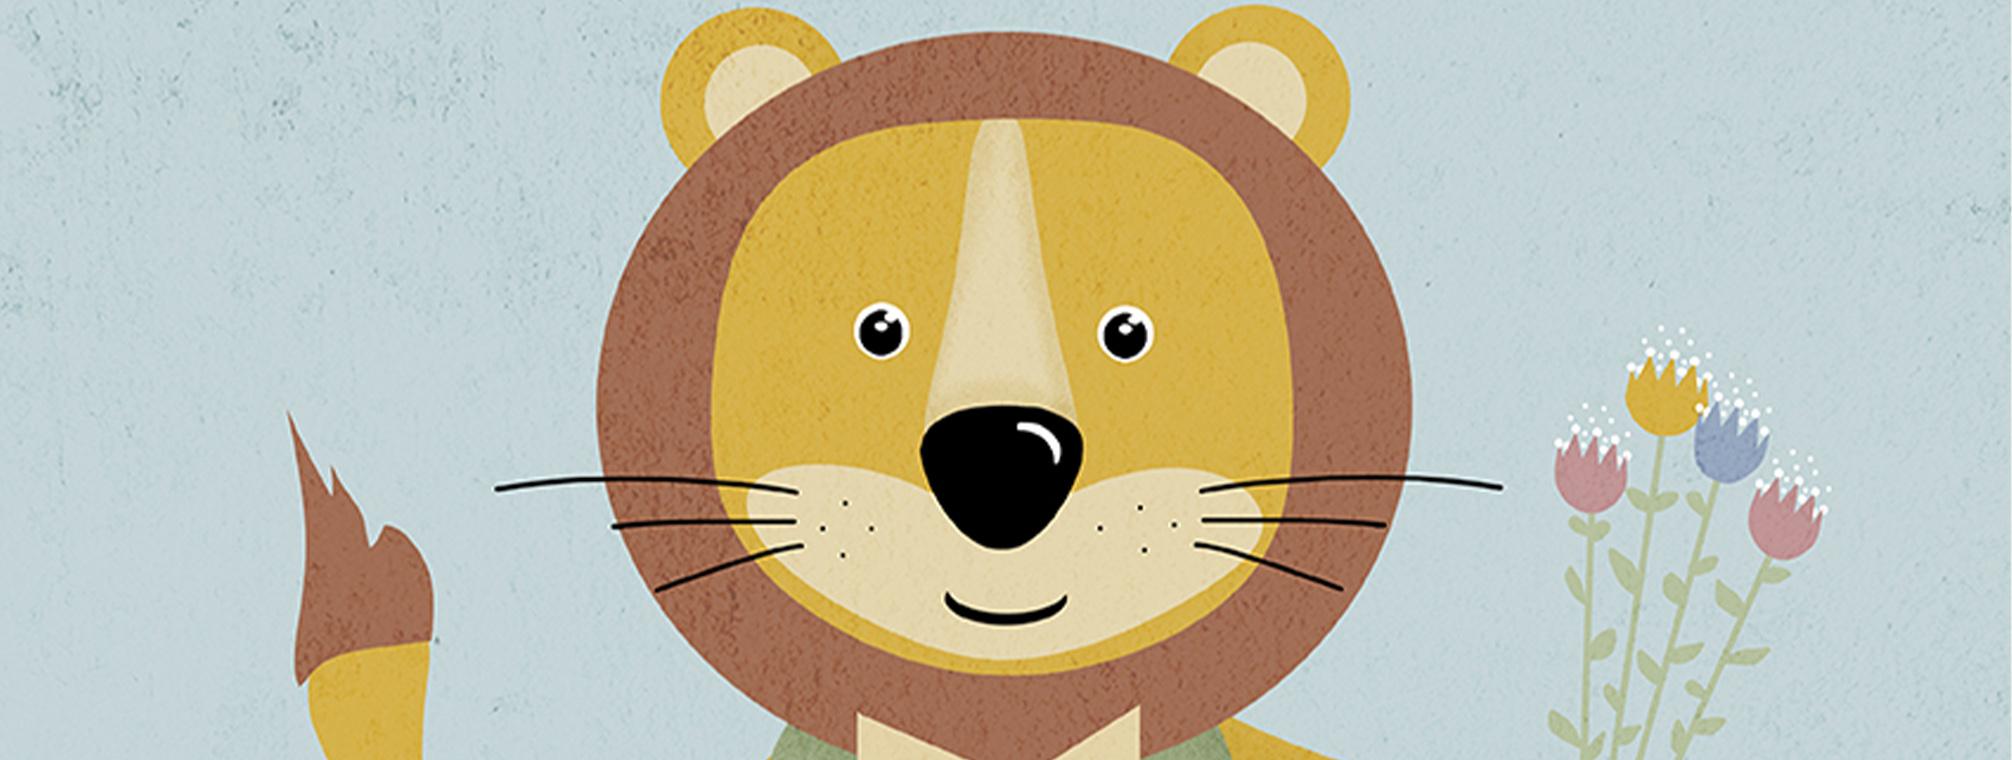 leone-trentinelli